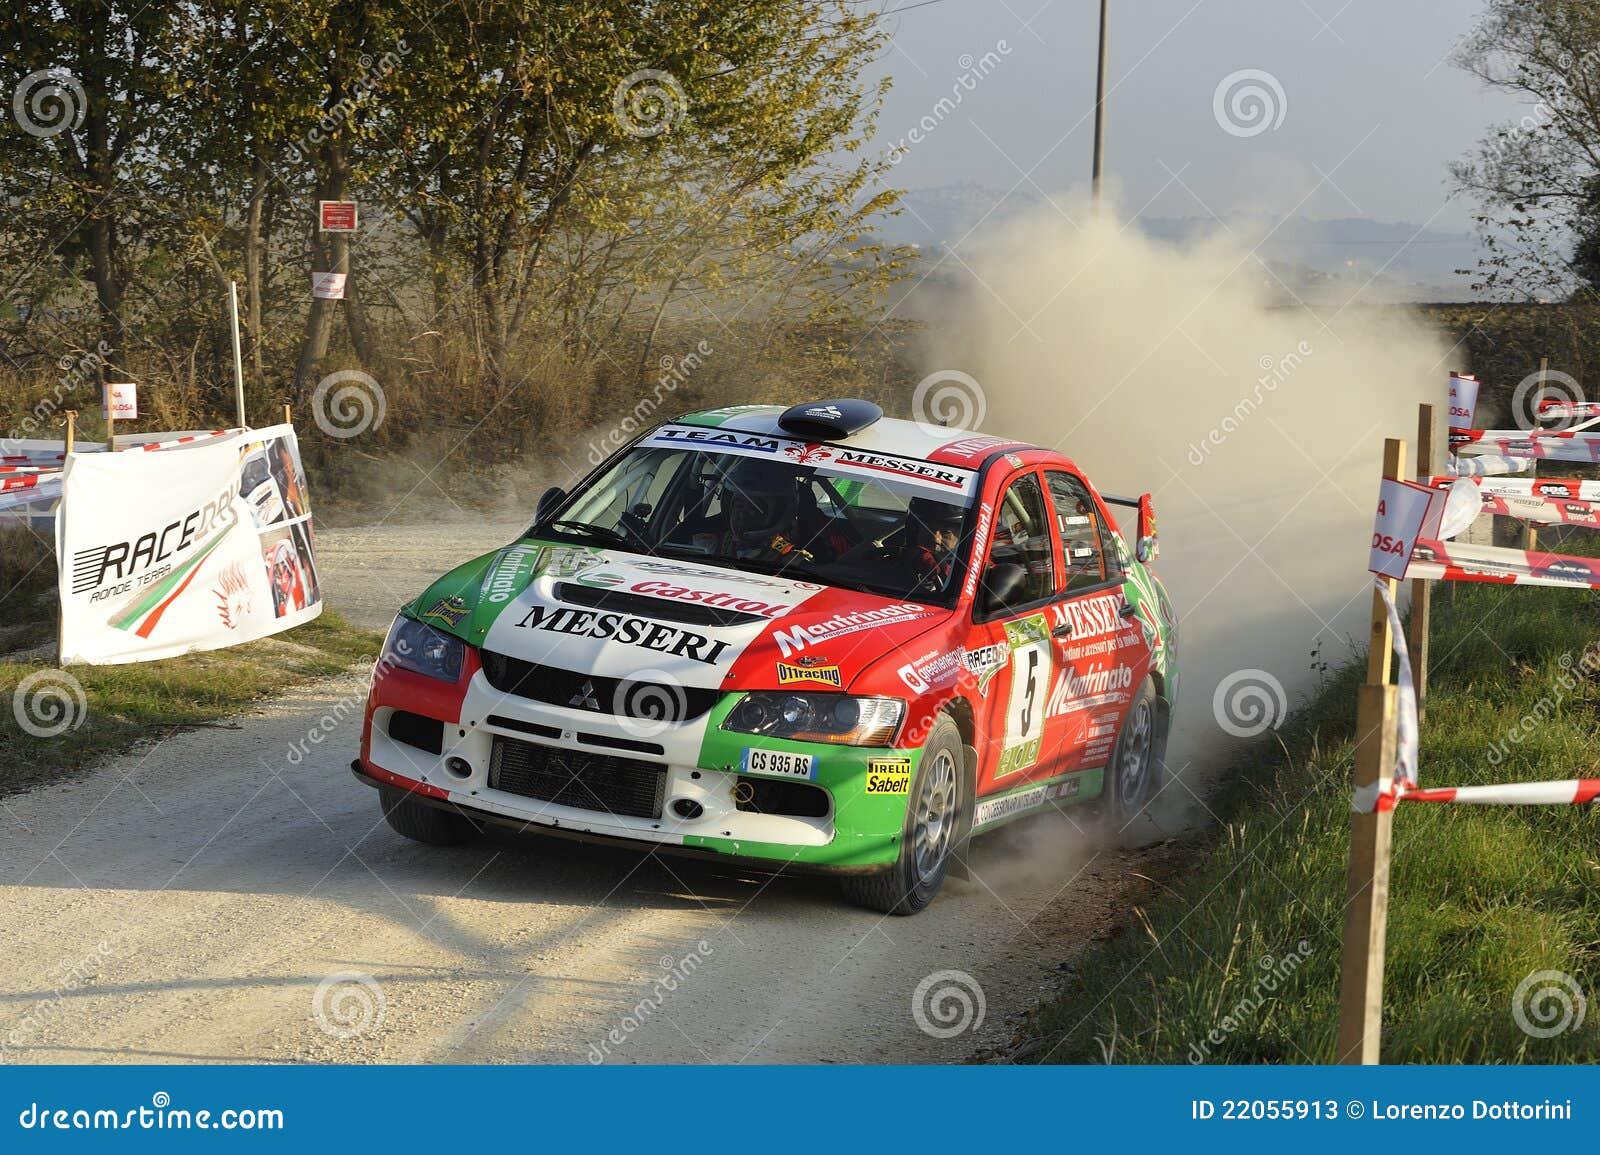 Mitsubishi Lancer Evo IX Rally Car Editorial Stock Photo - Image ...